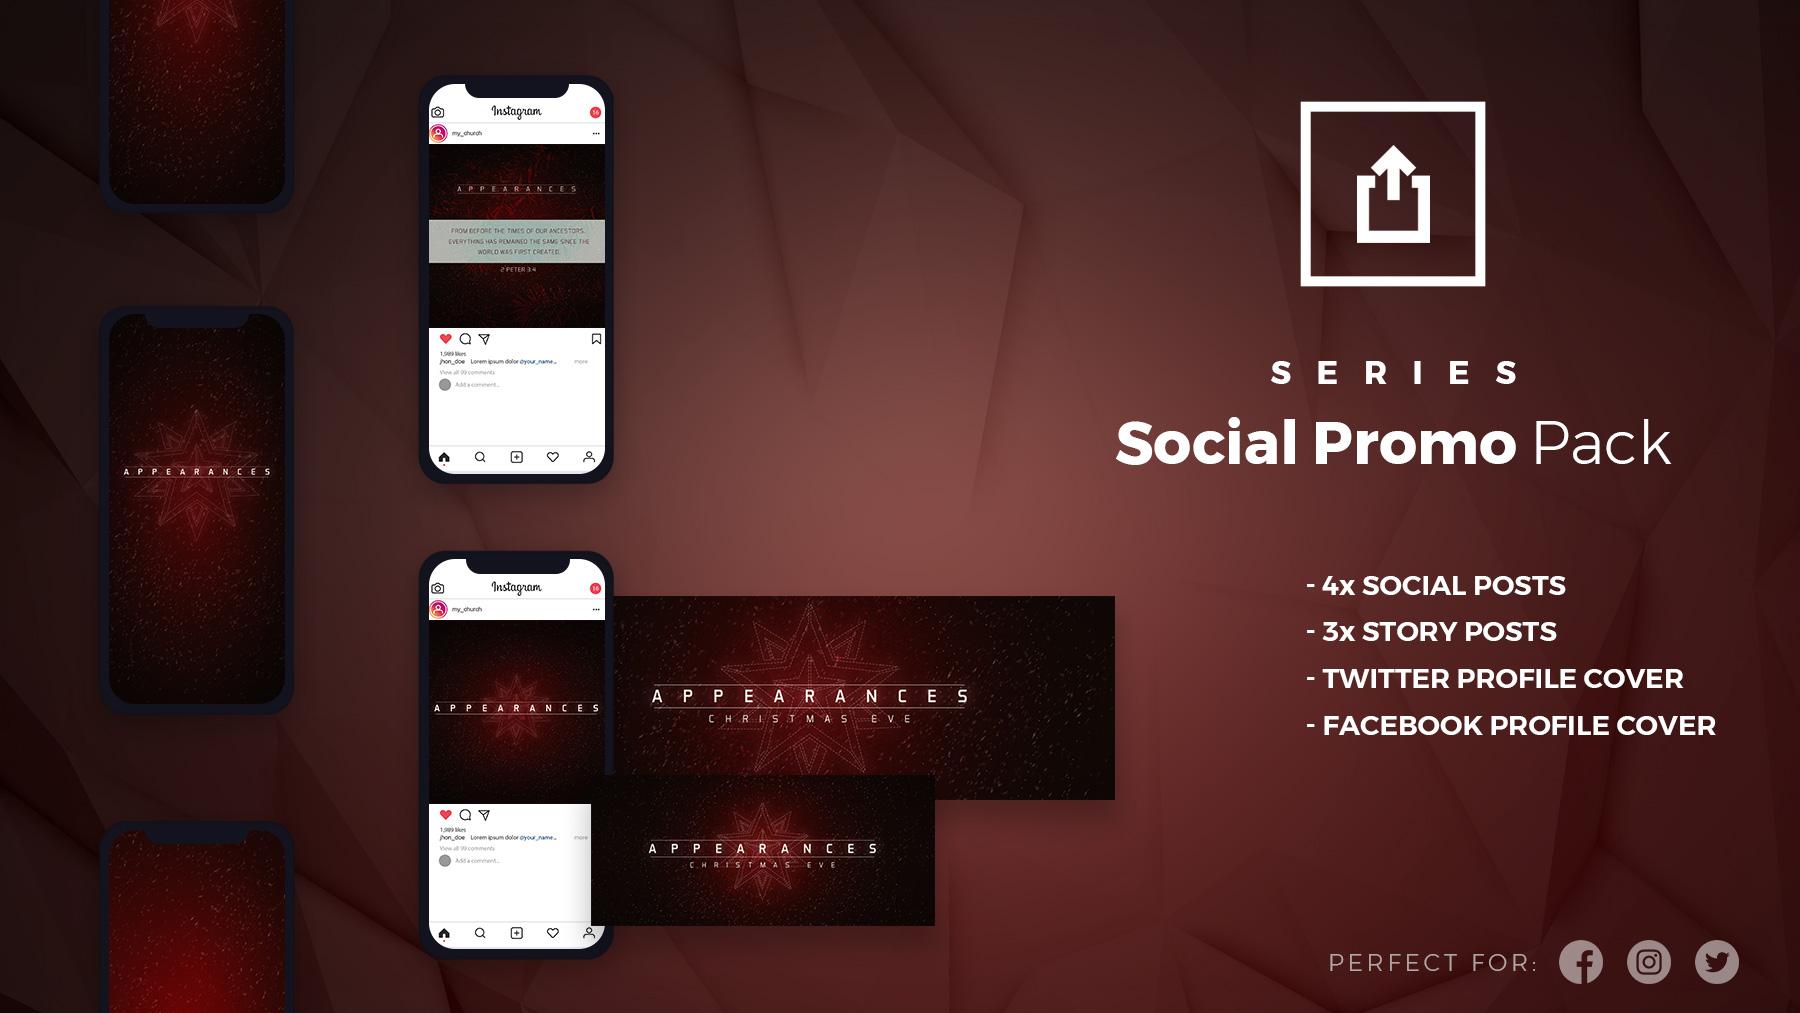 Apnc Social Promo